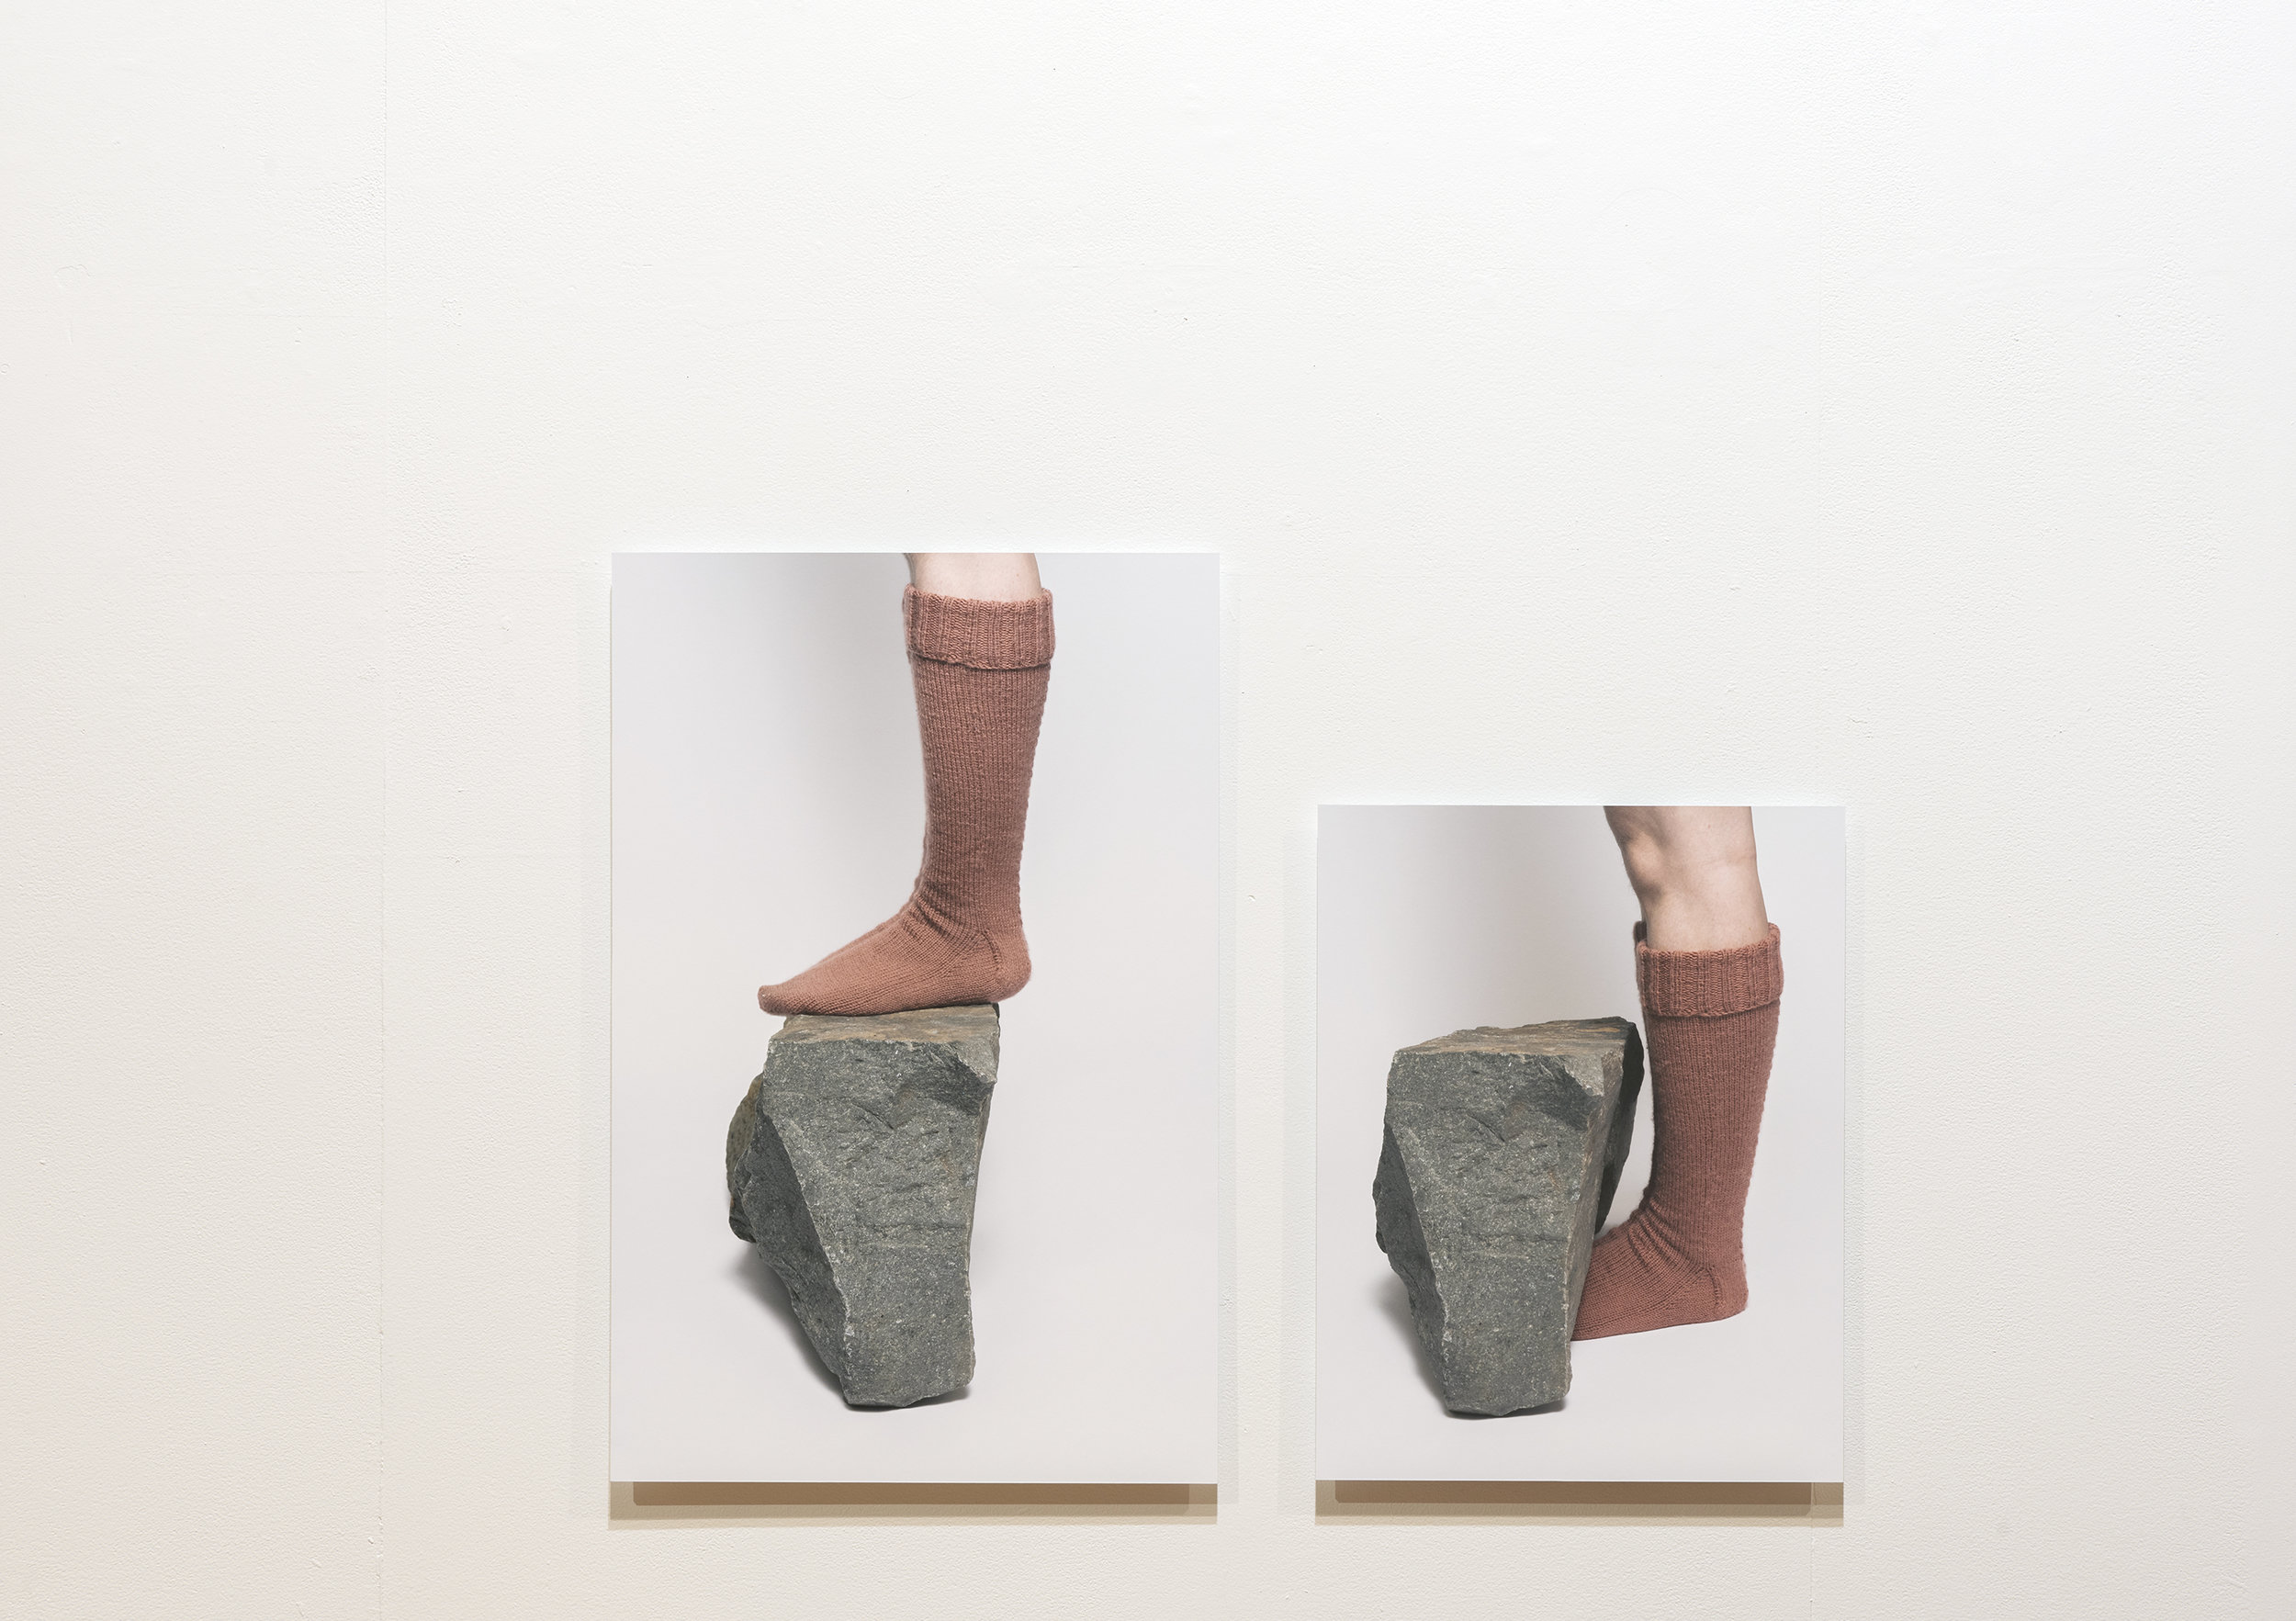 Rock Socks 1 & 2